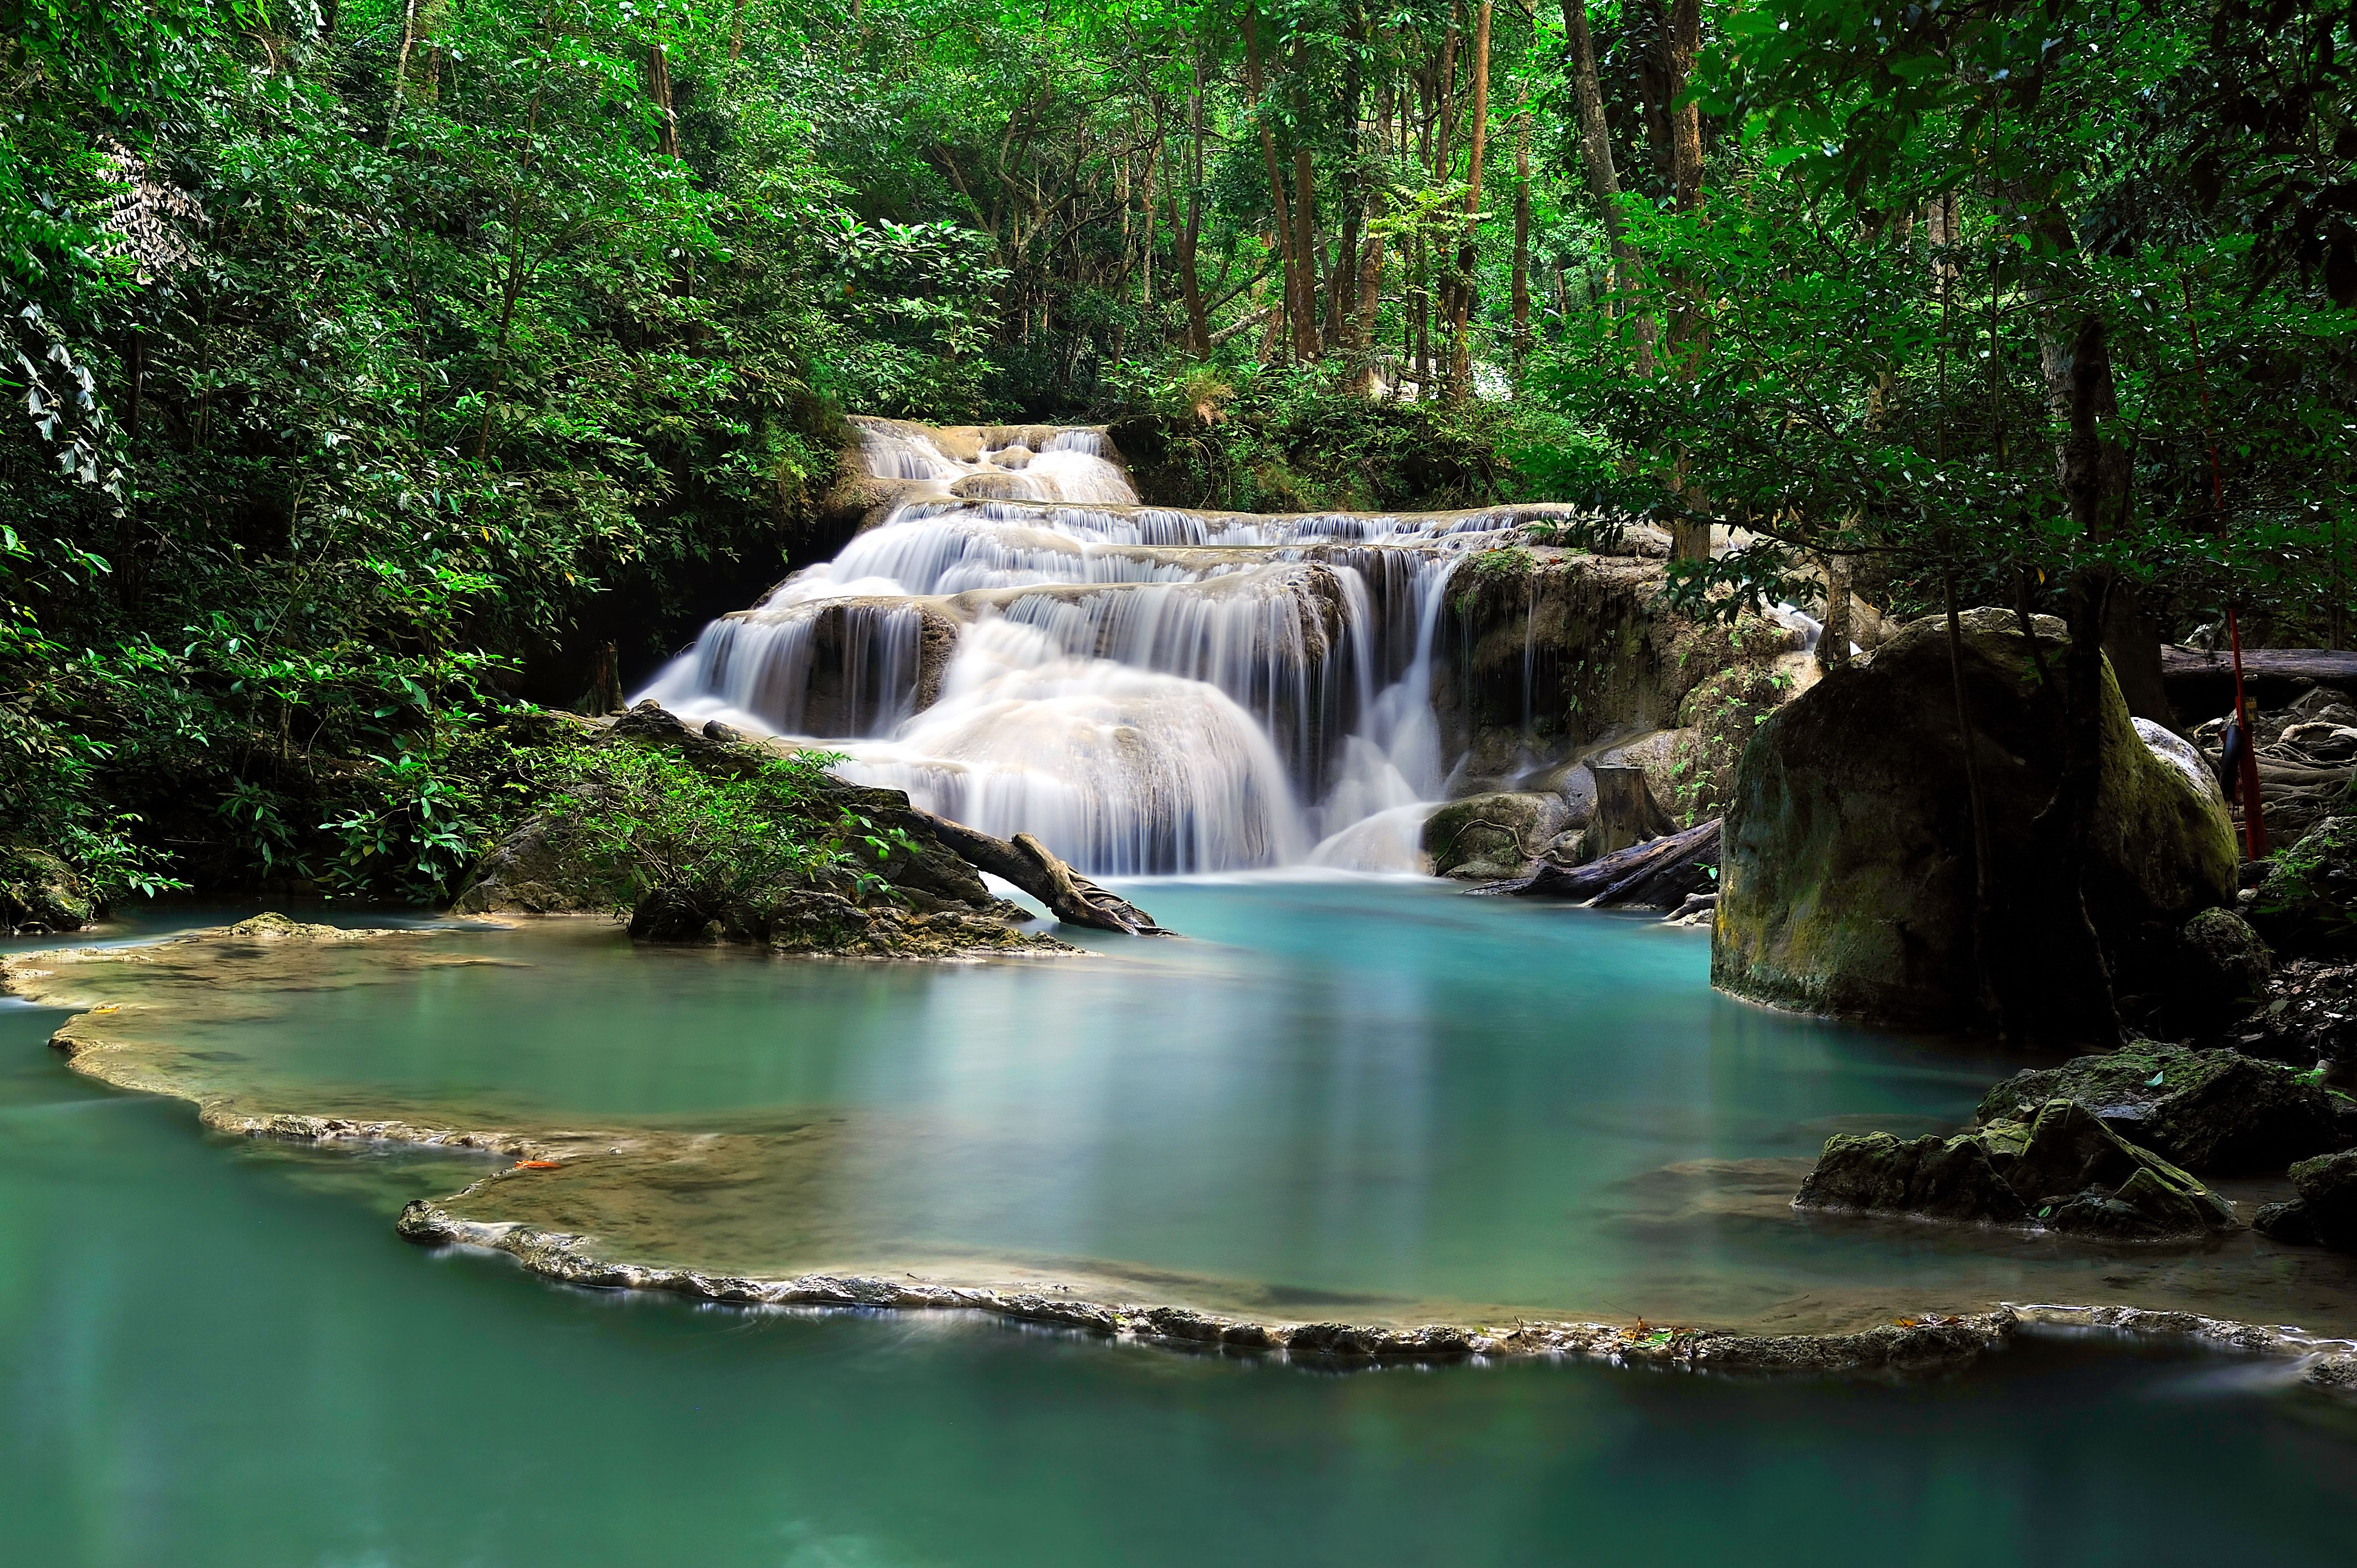 Blue pools at Erawan Falls near Kanchanaburi, Thailand